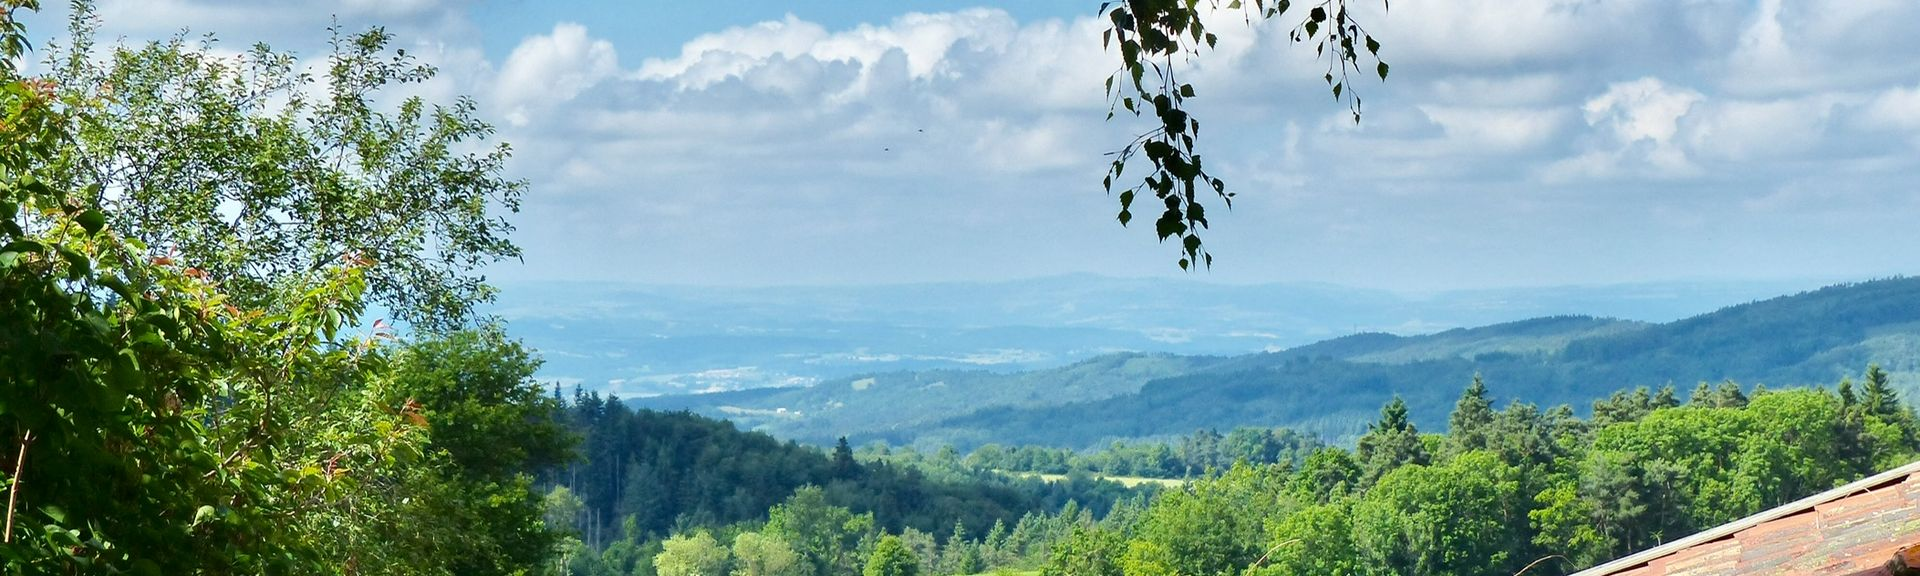 Orbeil, Auvergne-Rhône-Alpes, Frankreich